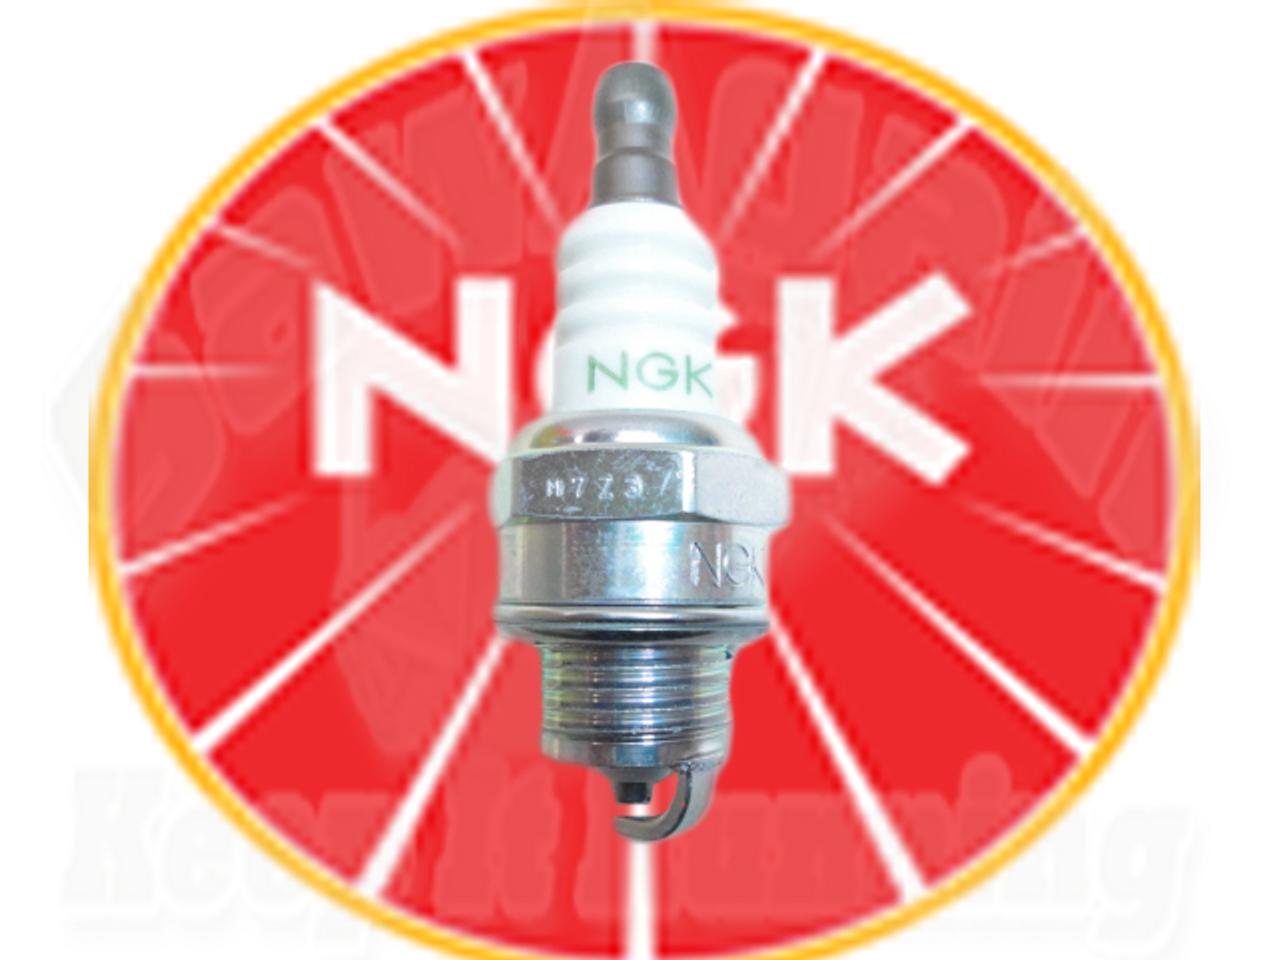 Spark Plug NGK BPMR7A Stihl Chainsaws Models MS 170 180 192T 200 210 230 250 260